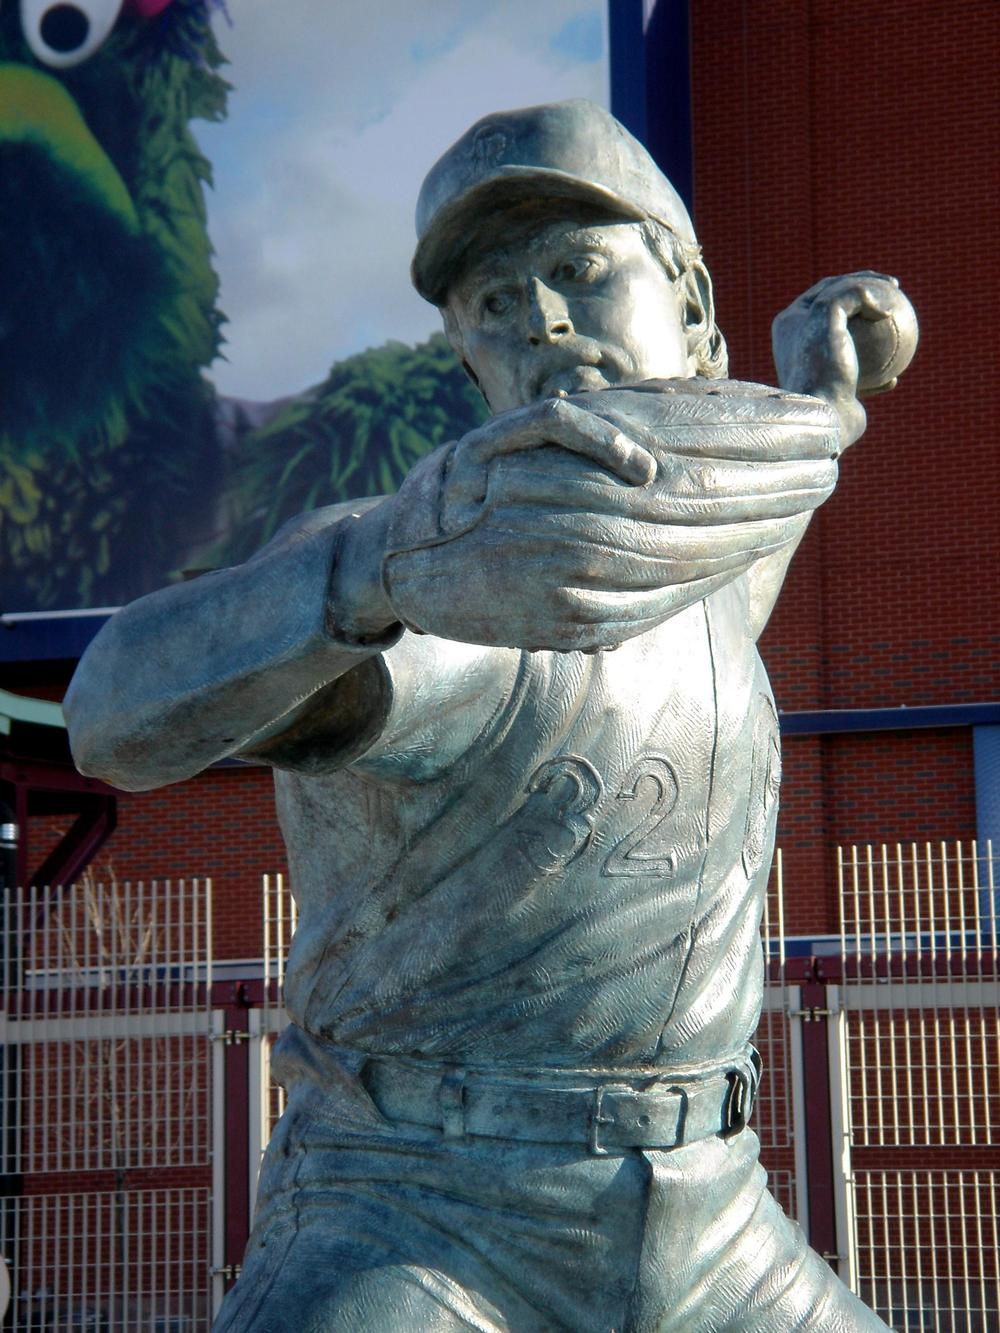 Steve Carlton, portrait statue